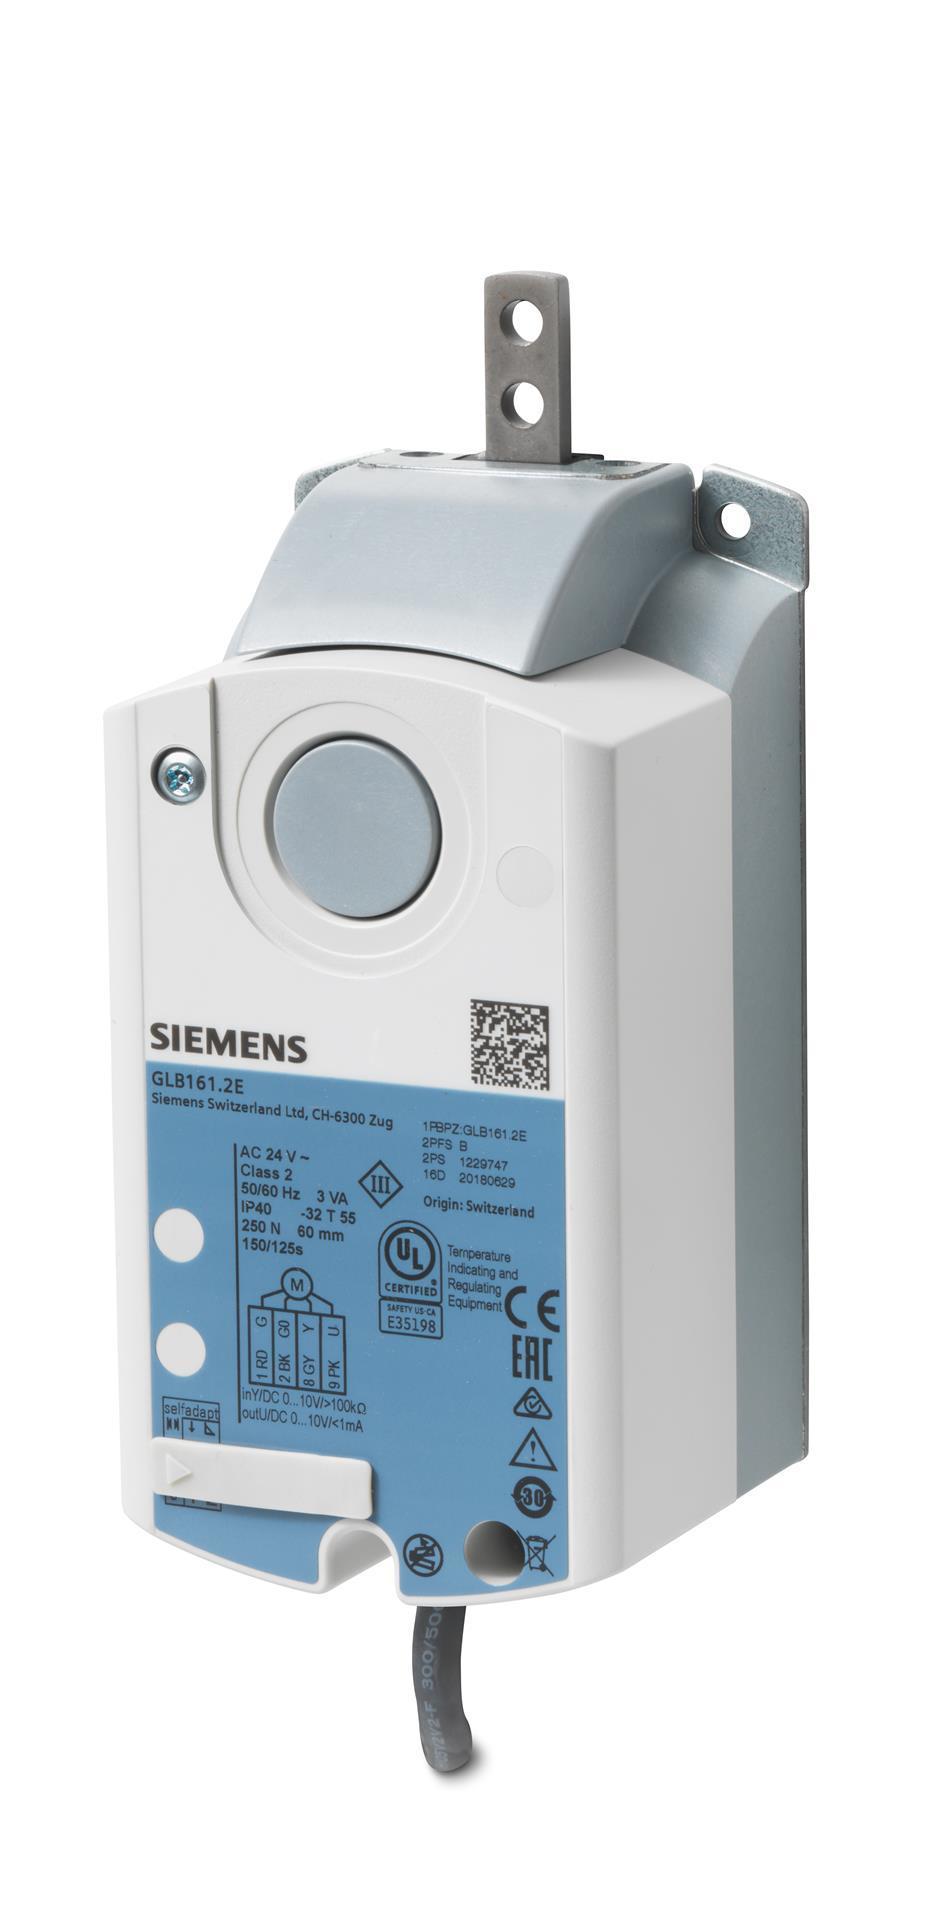 Siemens GLB161.2E